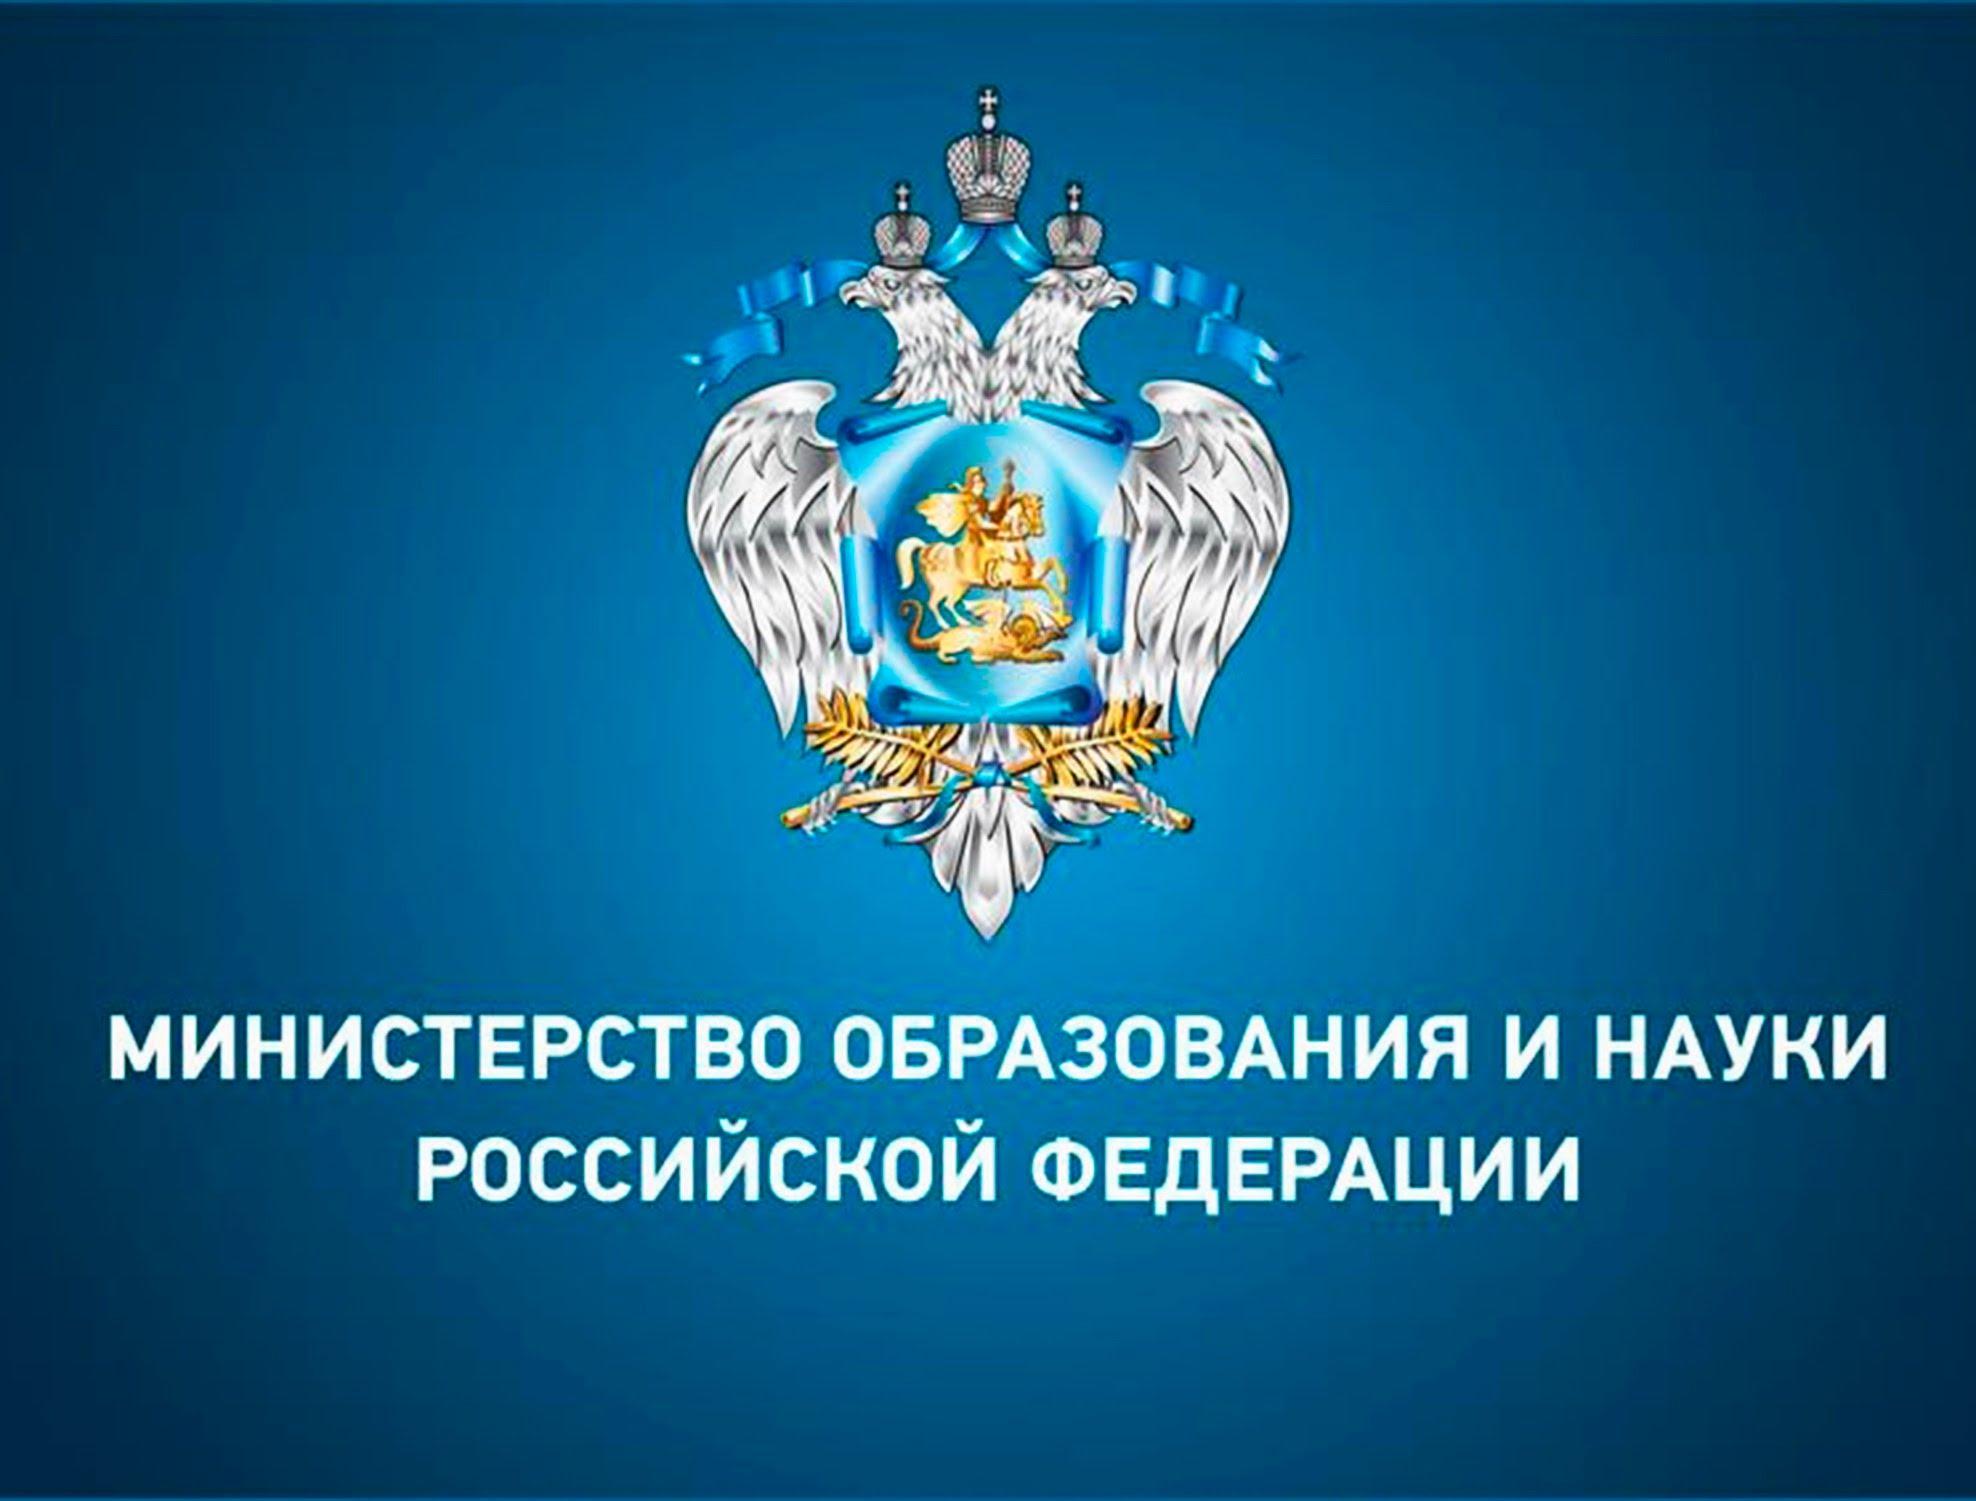 http://минобрнауки.рф